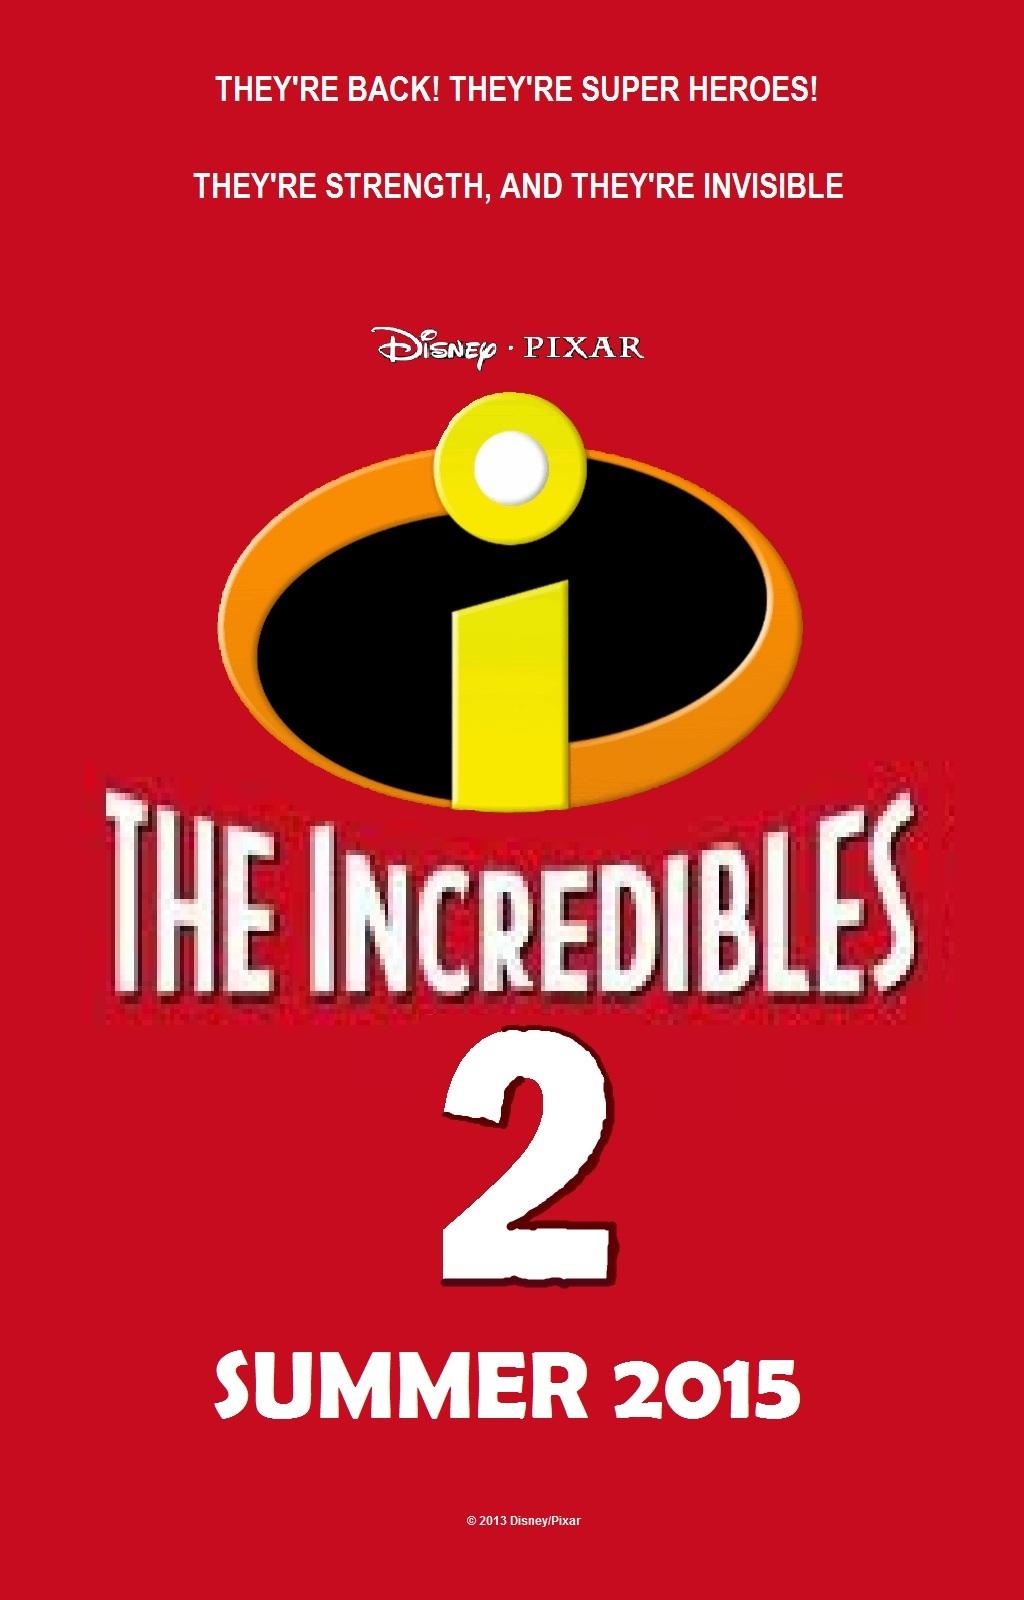 Image The Incredibles 2 Poster Jpg Pixar Wiki Disney